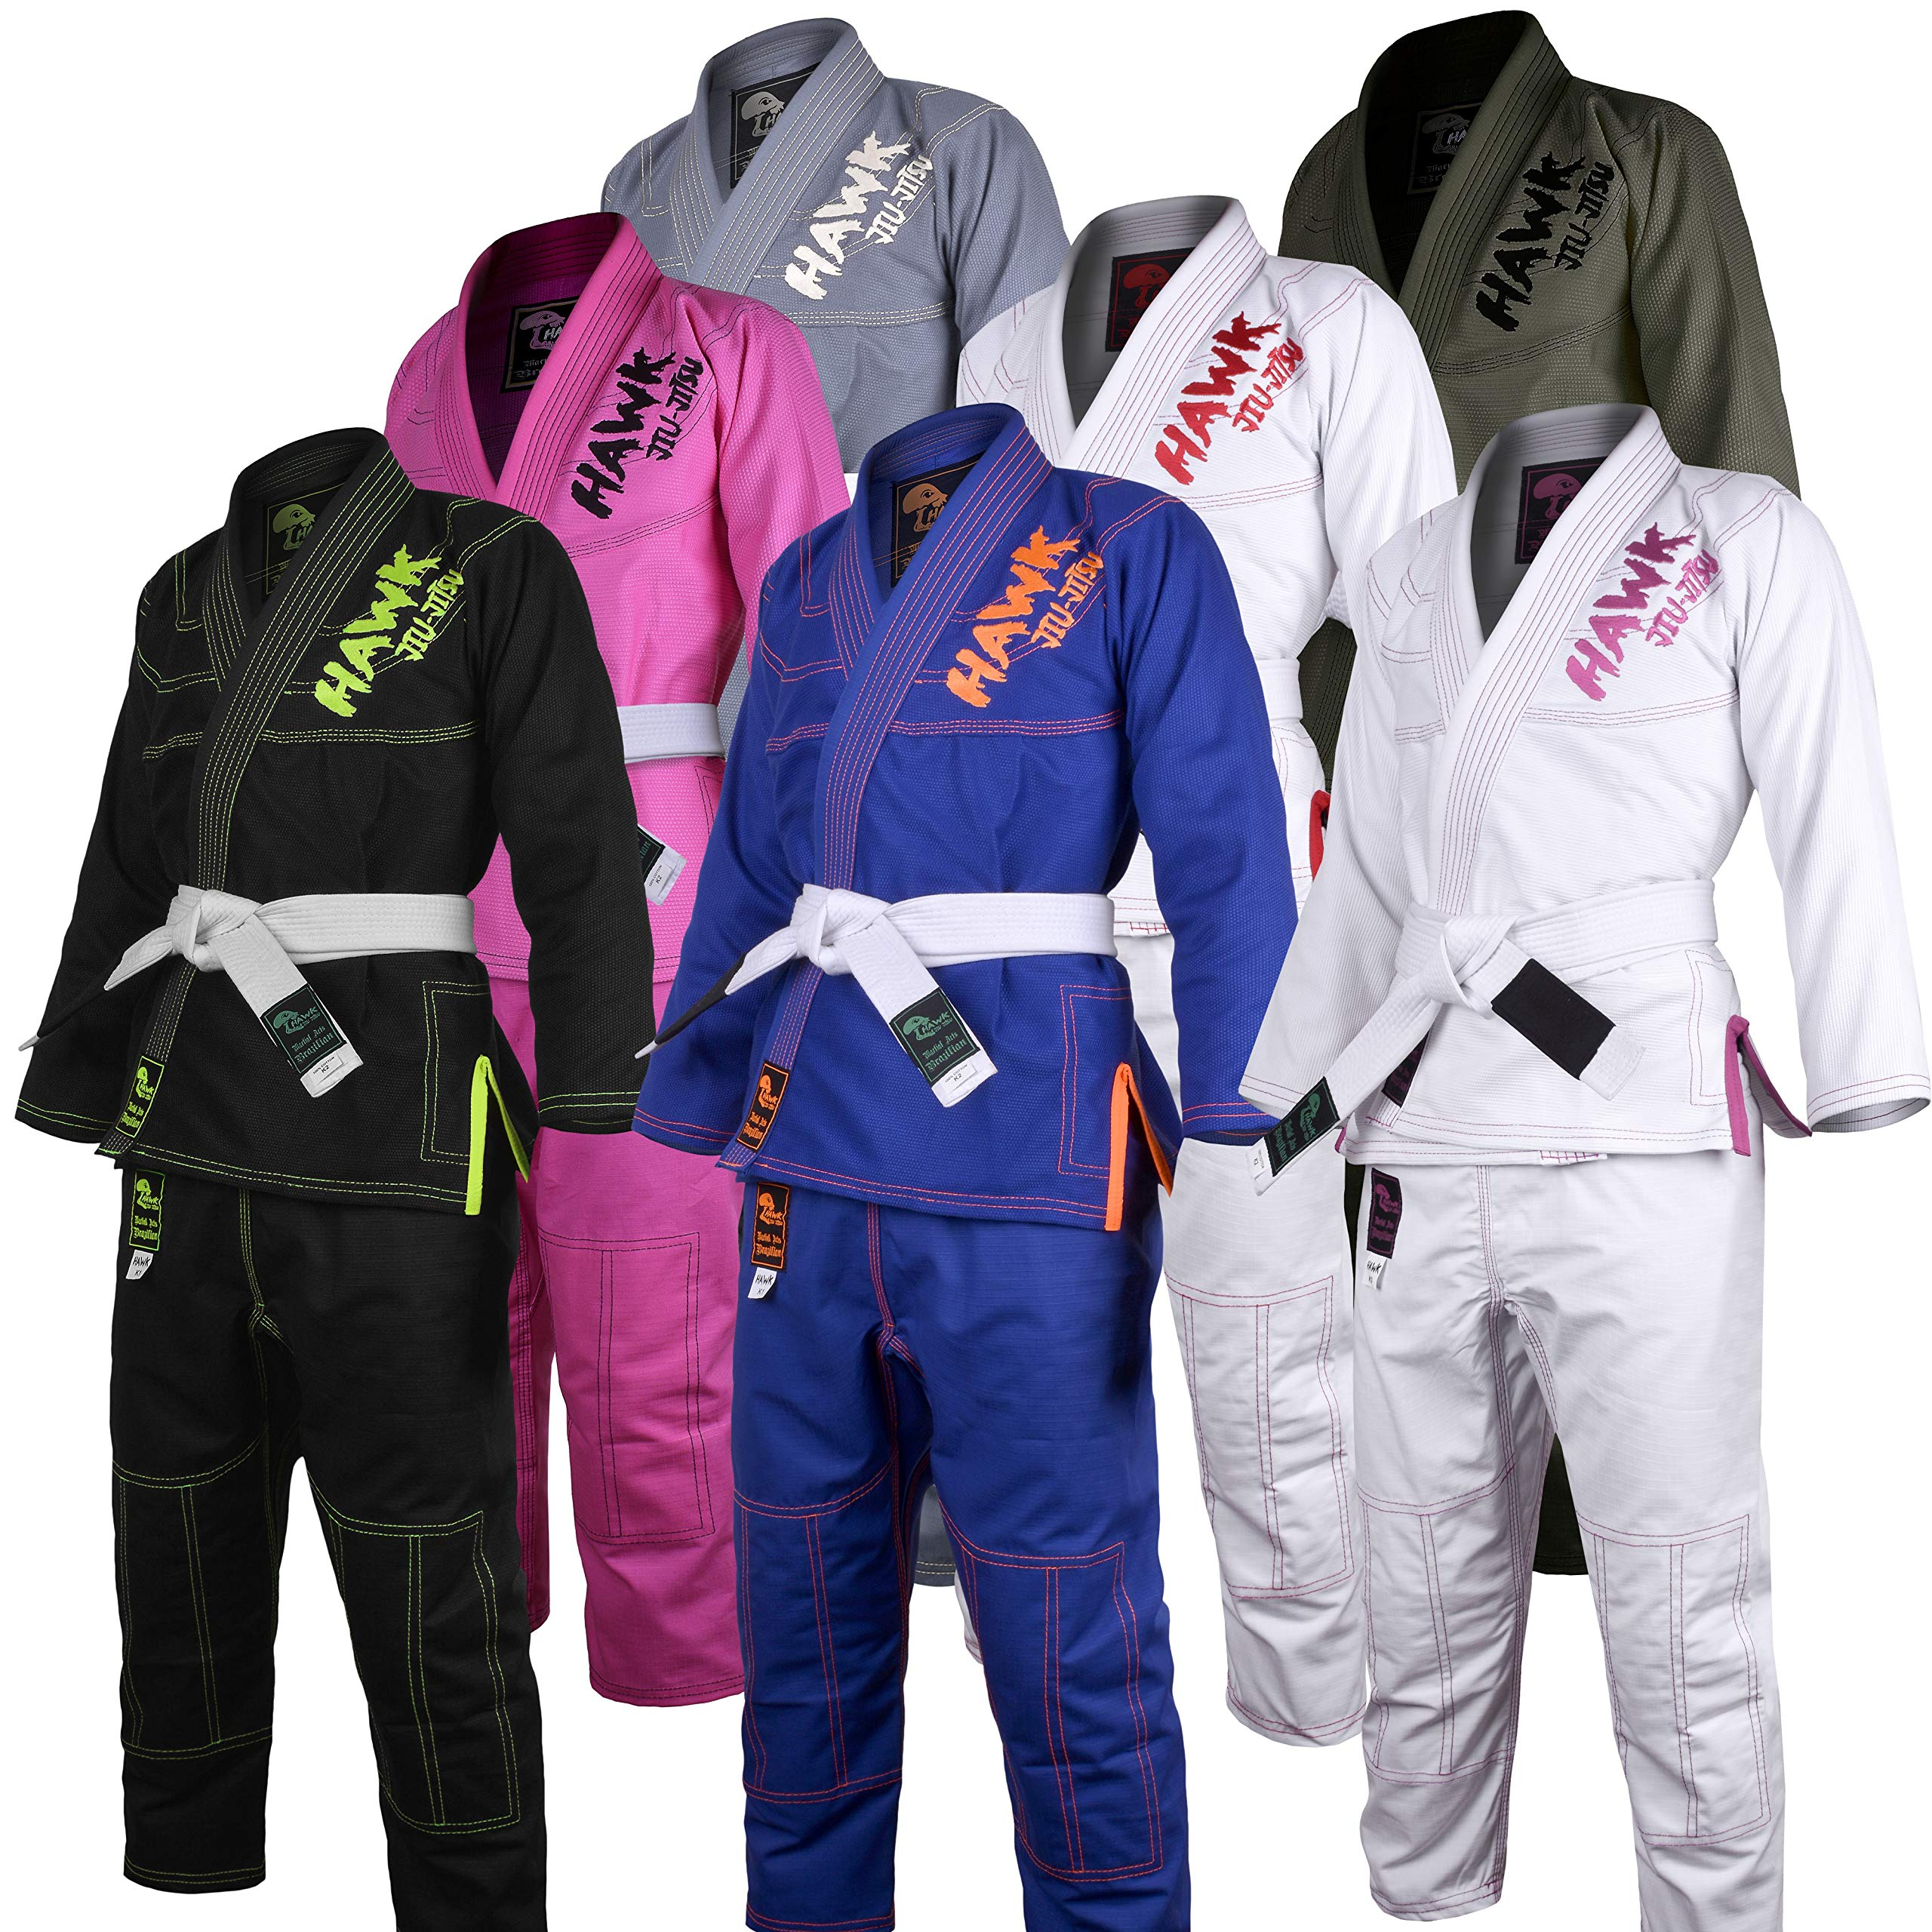 Hawk Kids Brazilian Jiu Jitsu Suit Youth Children BJJ Gi Kimonos Boys & Girls BJJ Uniform Lightweight Preshrunk Pearl Weave Fabric, with Free White Belt, 1 Year Warranty!!! (K0, Blue) by HAWK Jiu Jitsu